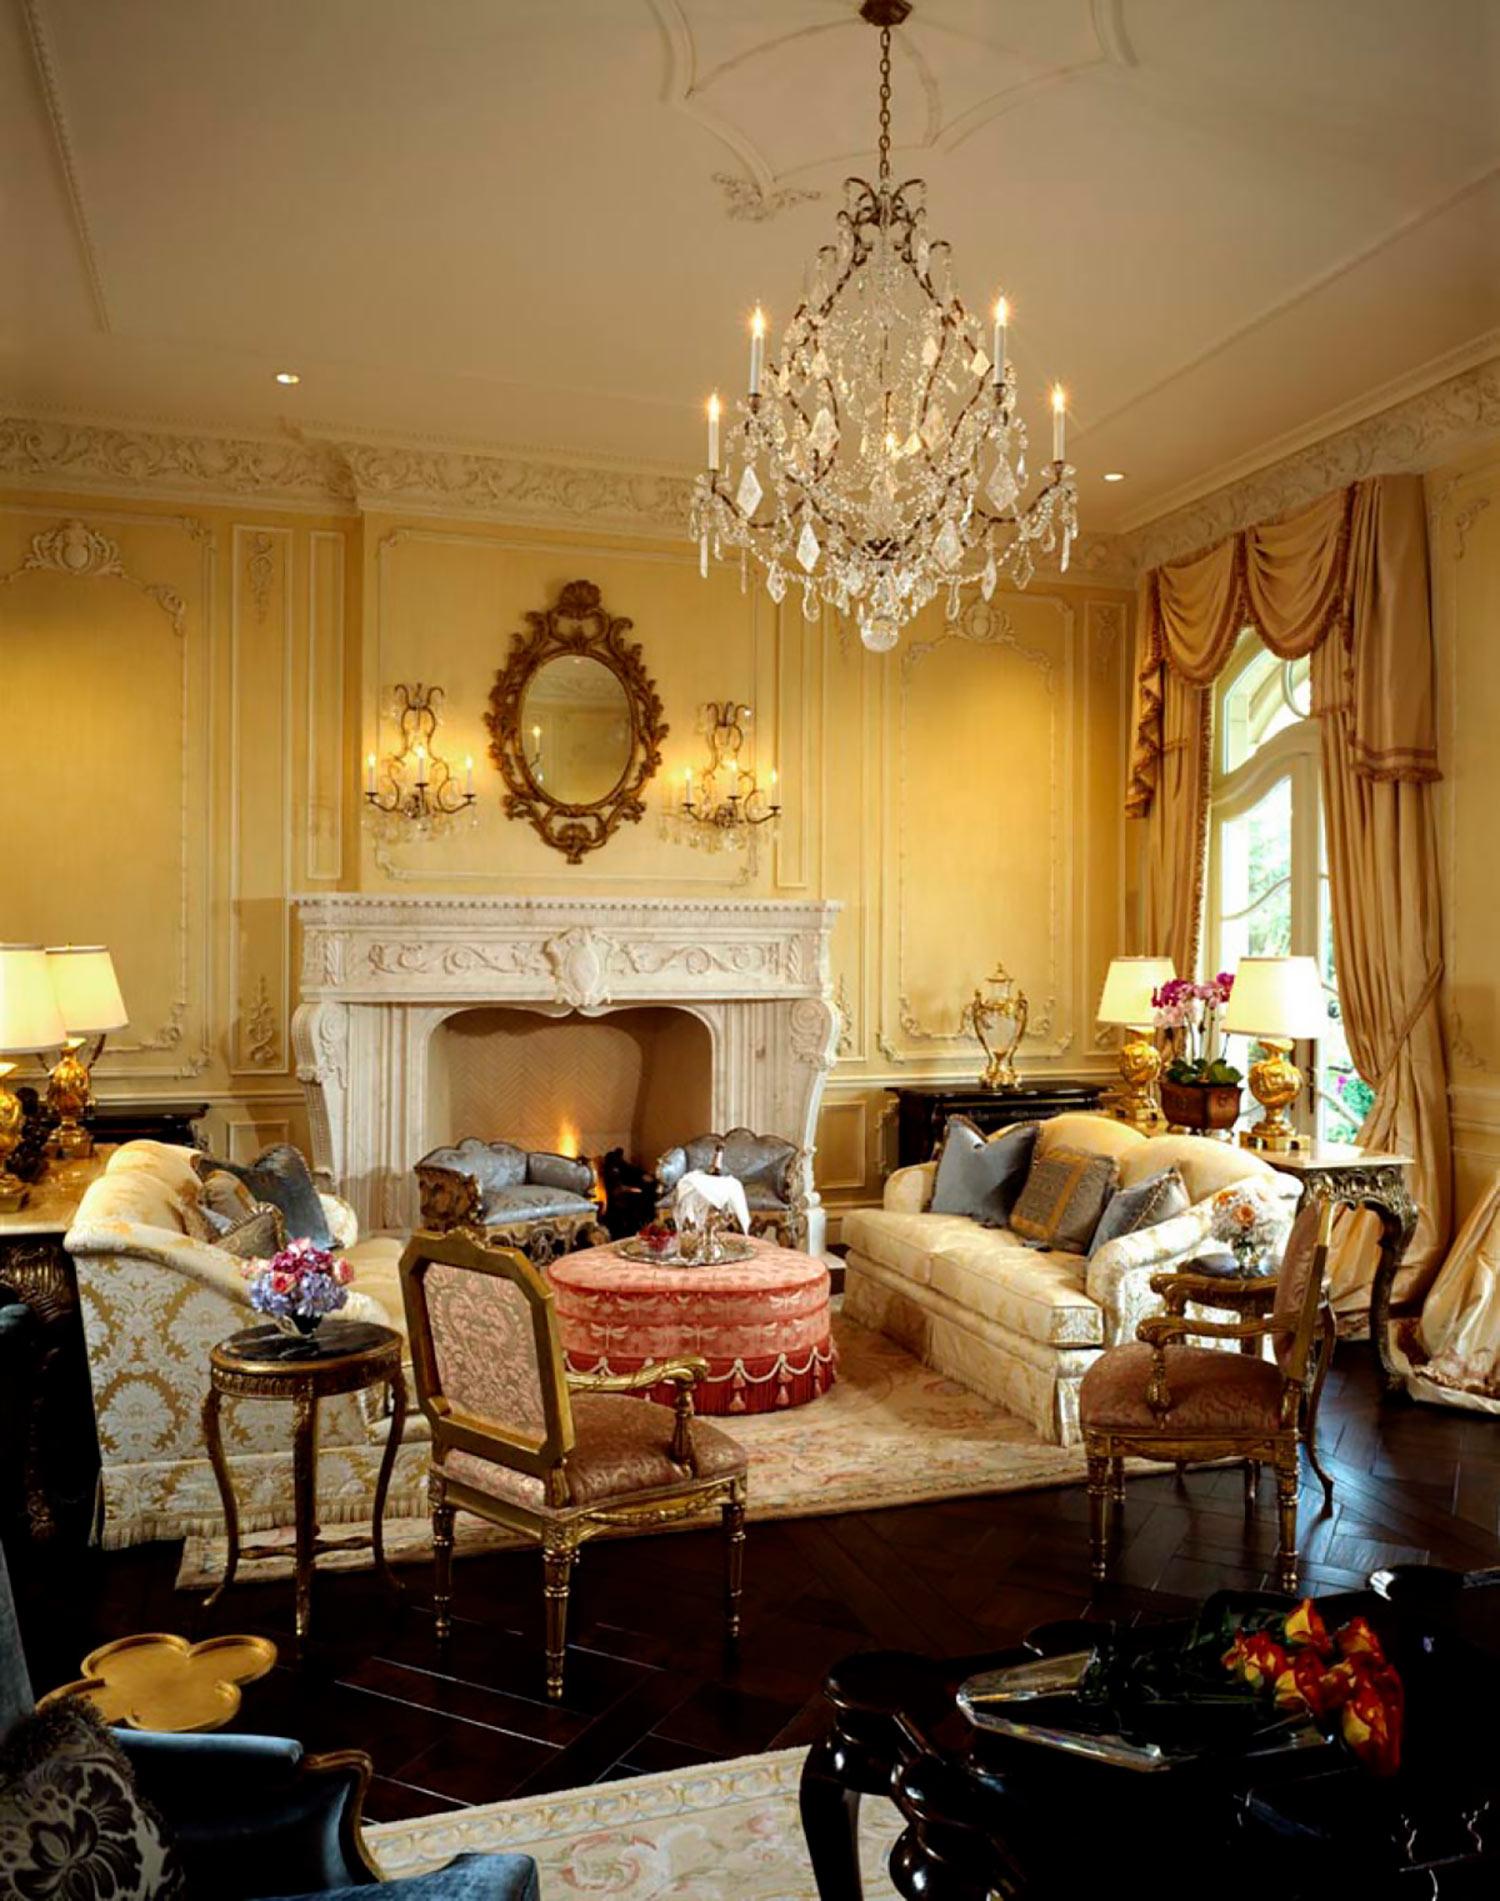 window treatments, custom upholstery, throw pillows Interior Design: Howard Design Group